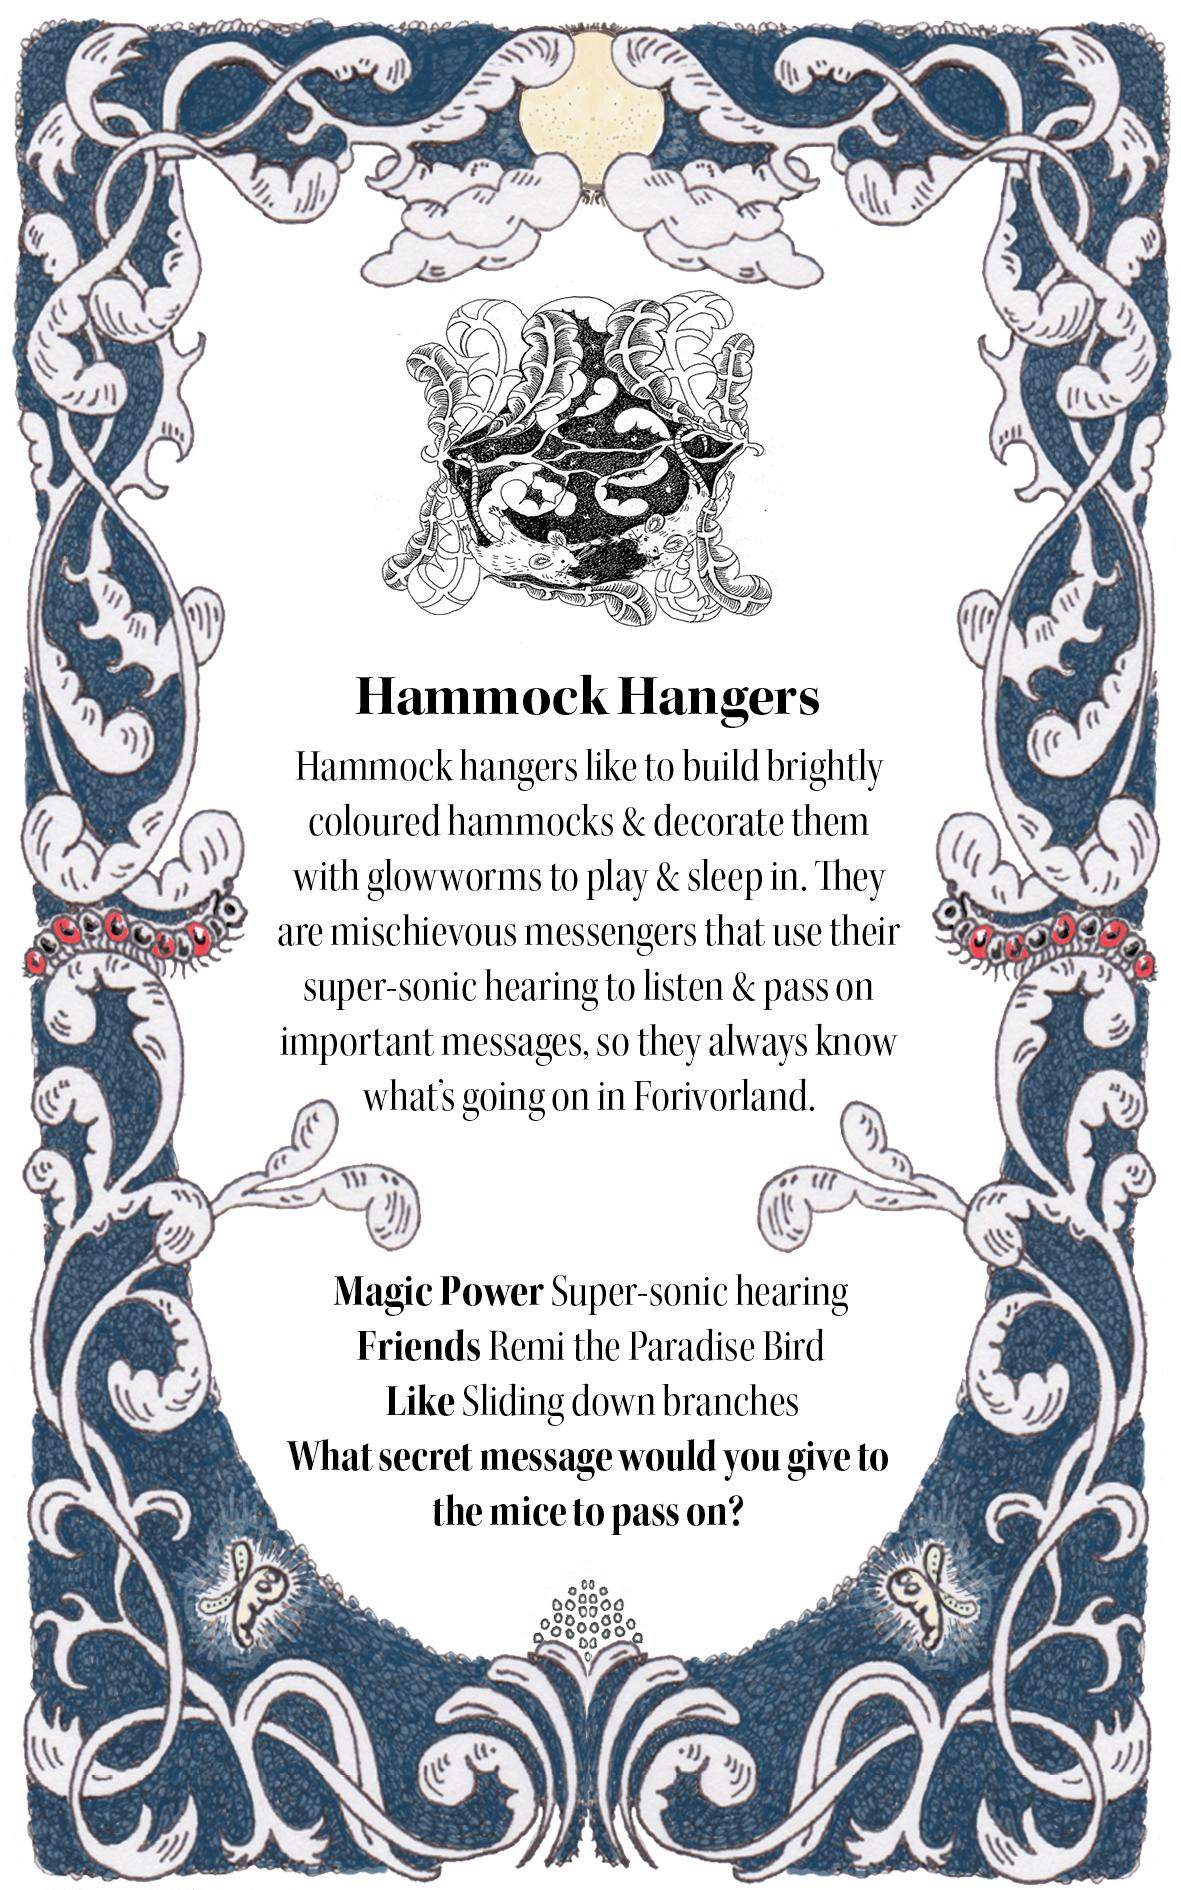 HammockHangers.jpg